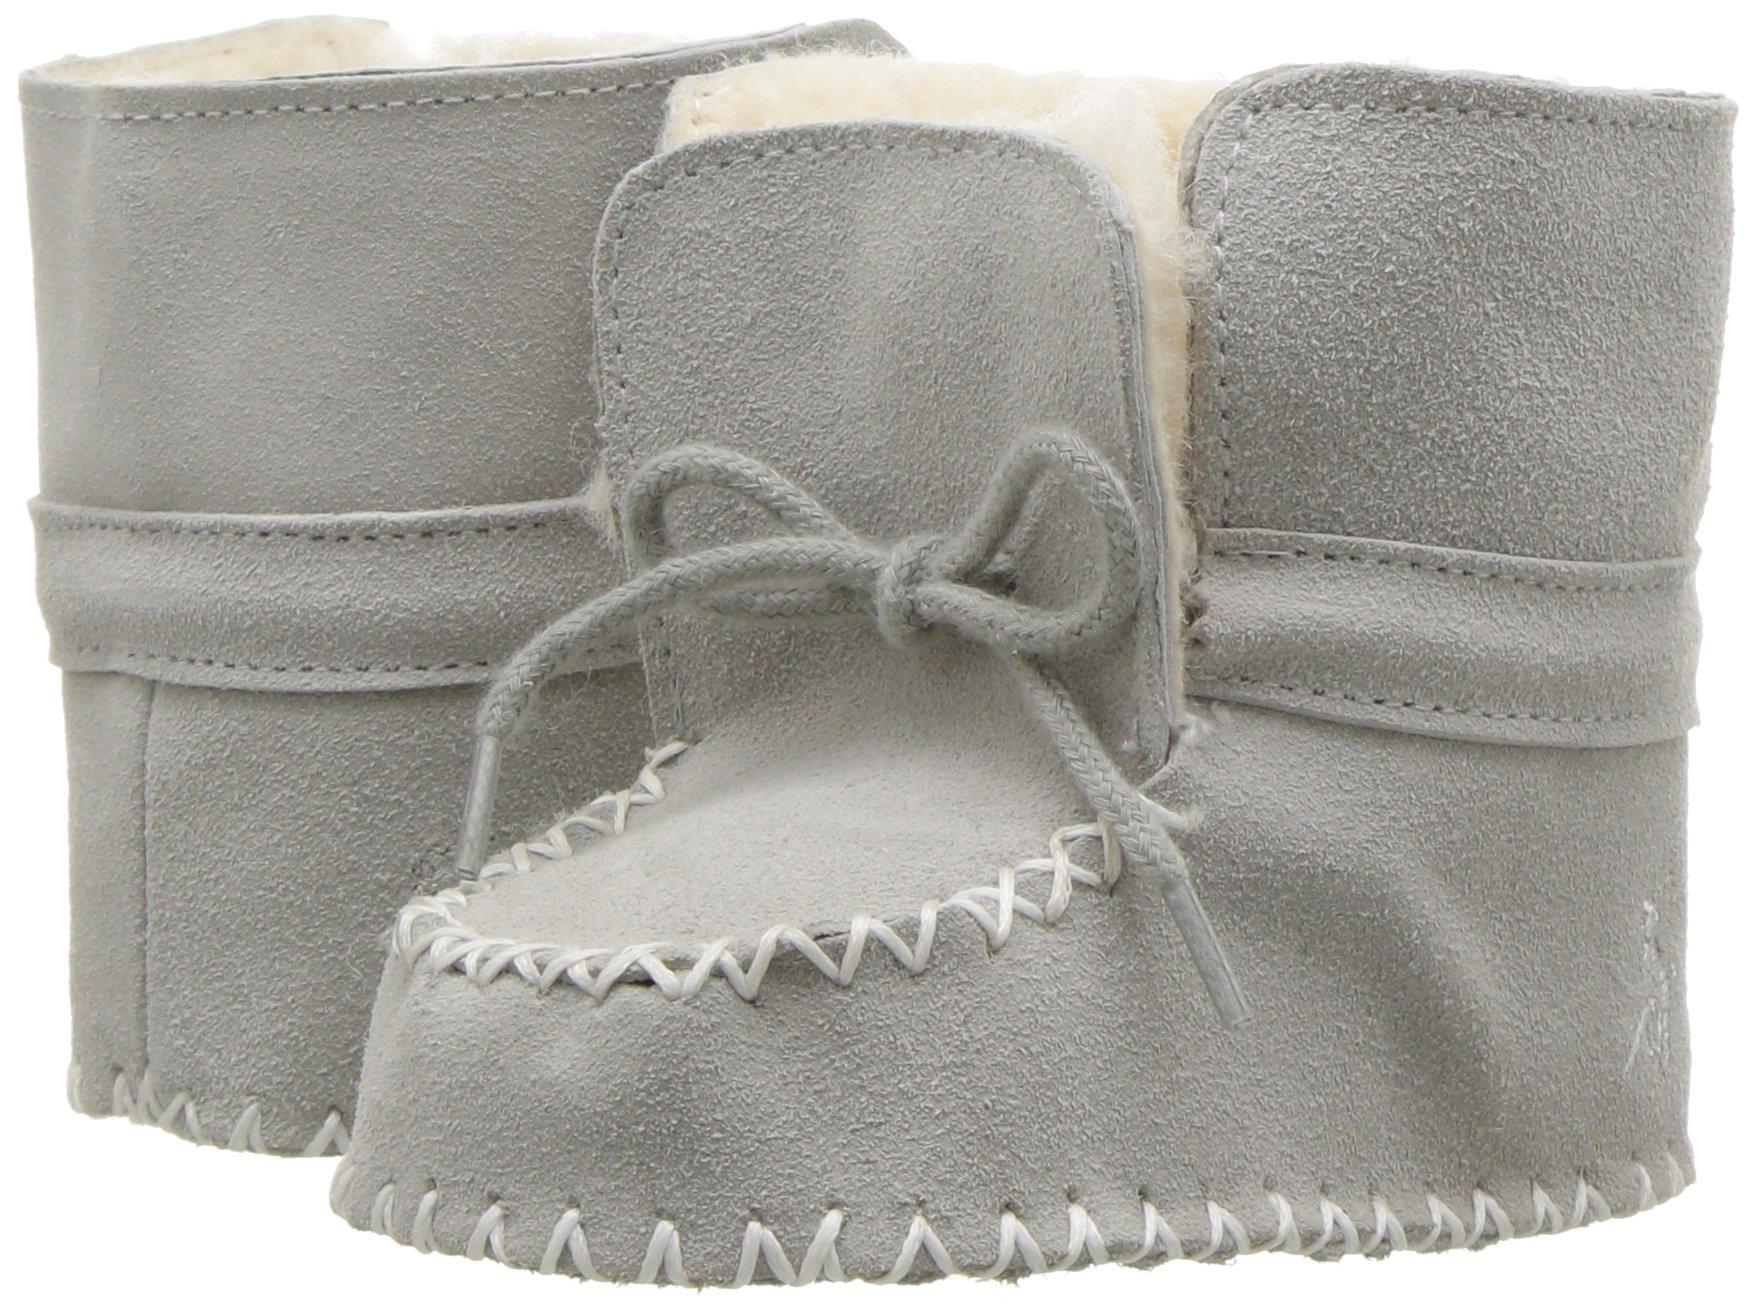 Ralph Lauren Layette Baby Pocono Boot, Grey Suede, 4 M US Infant